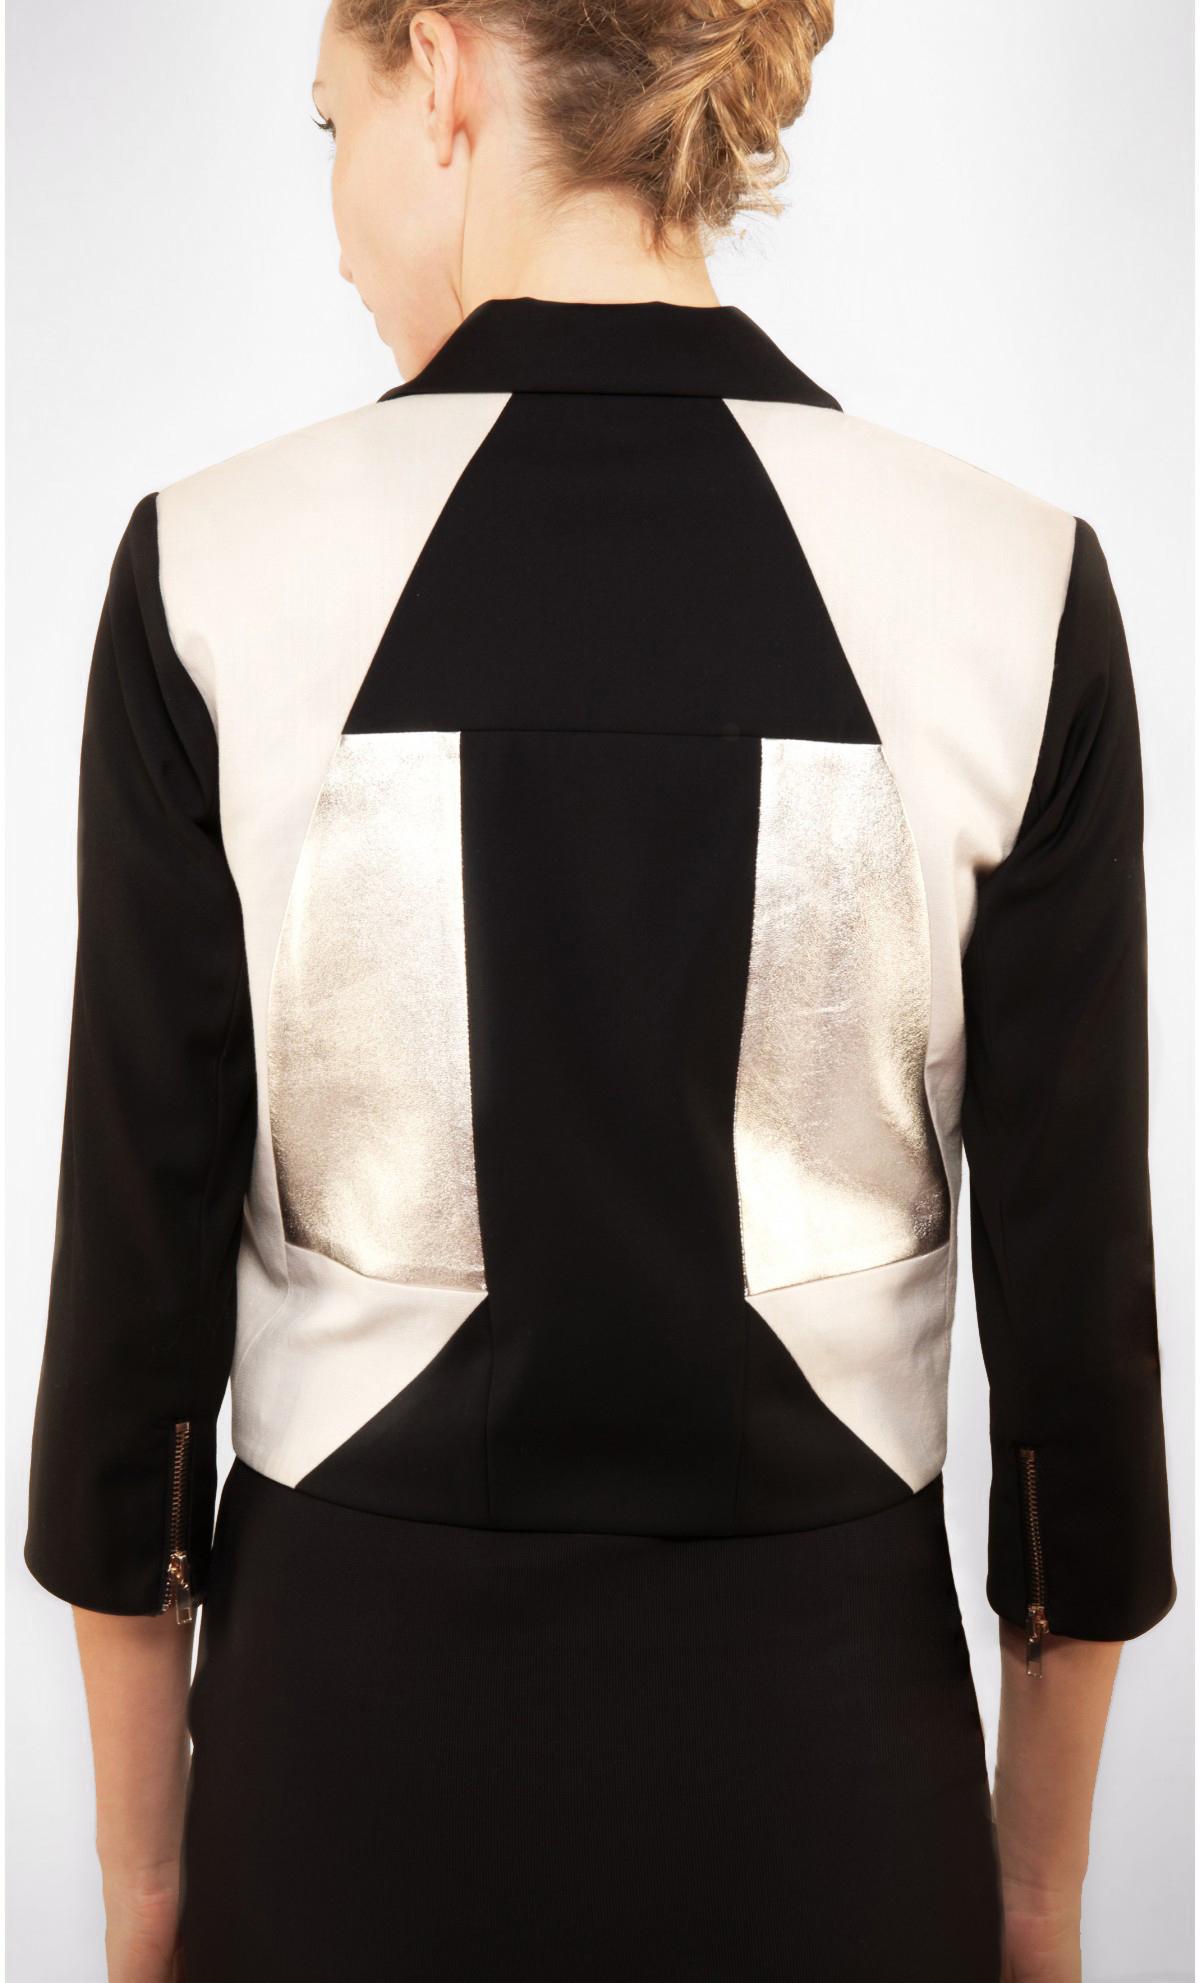 Perfecto cuir et draperie tailleur